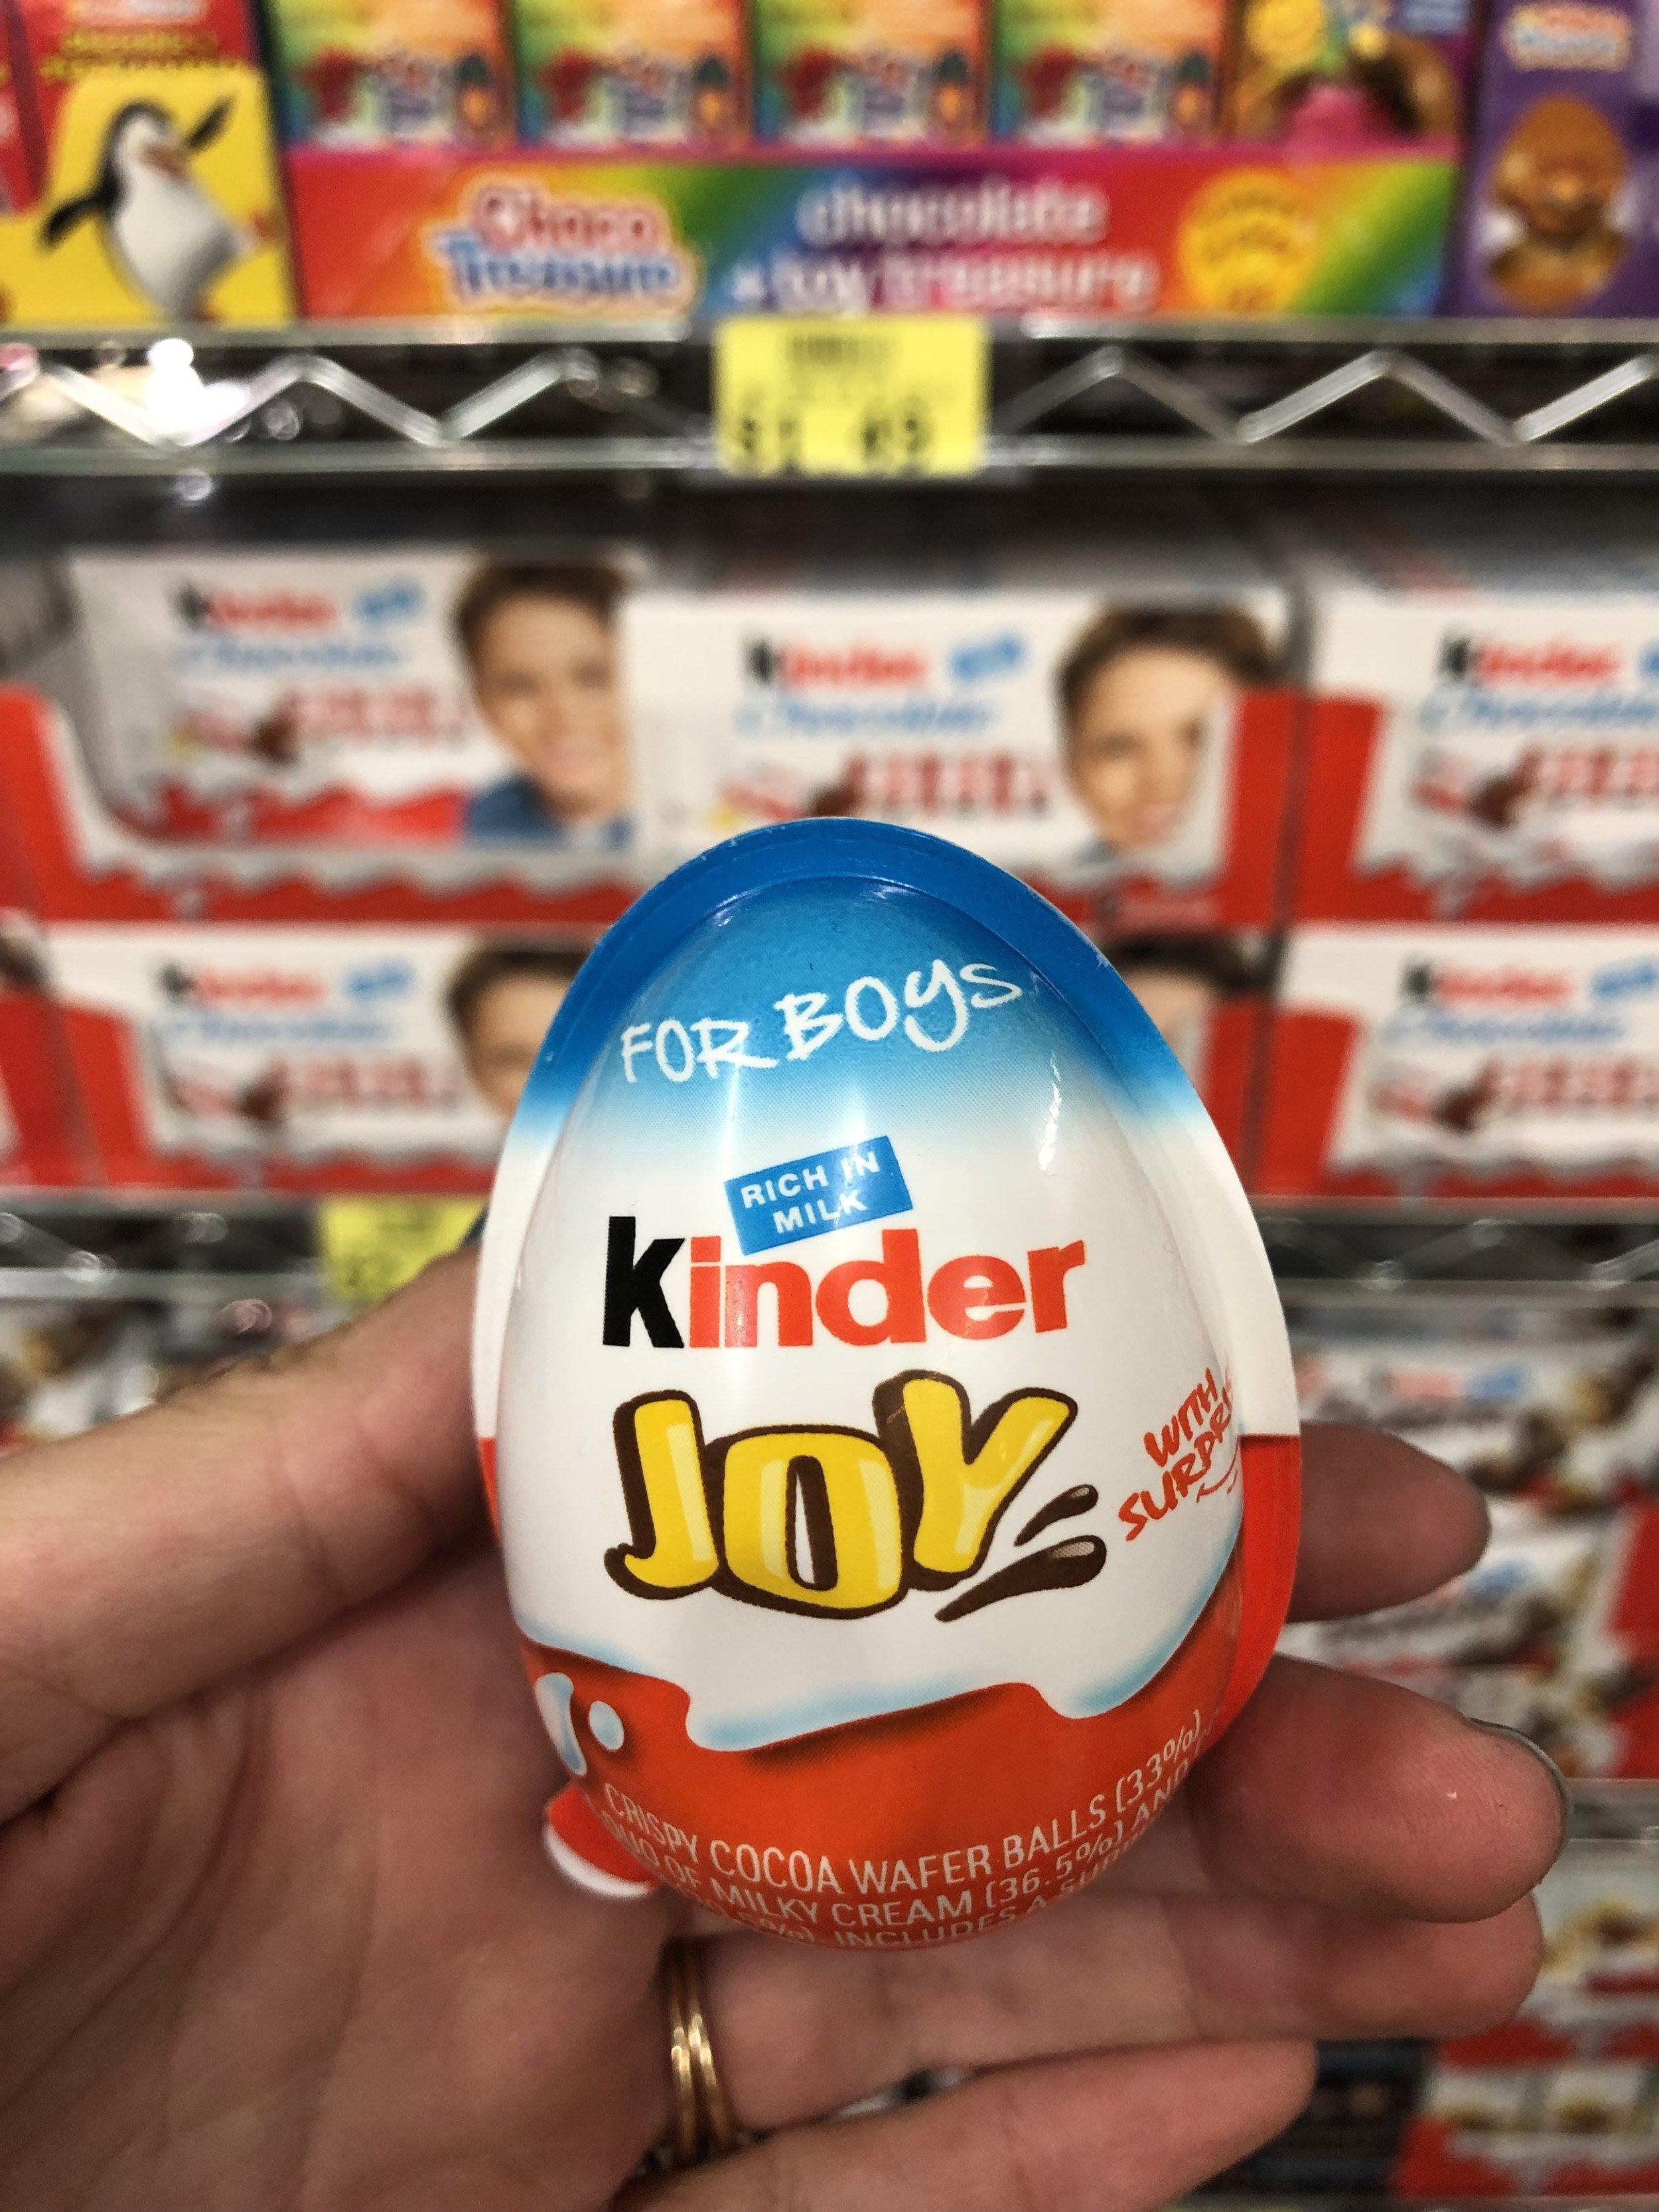 A popular European chocolate for kids